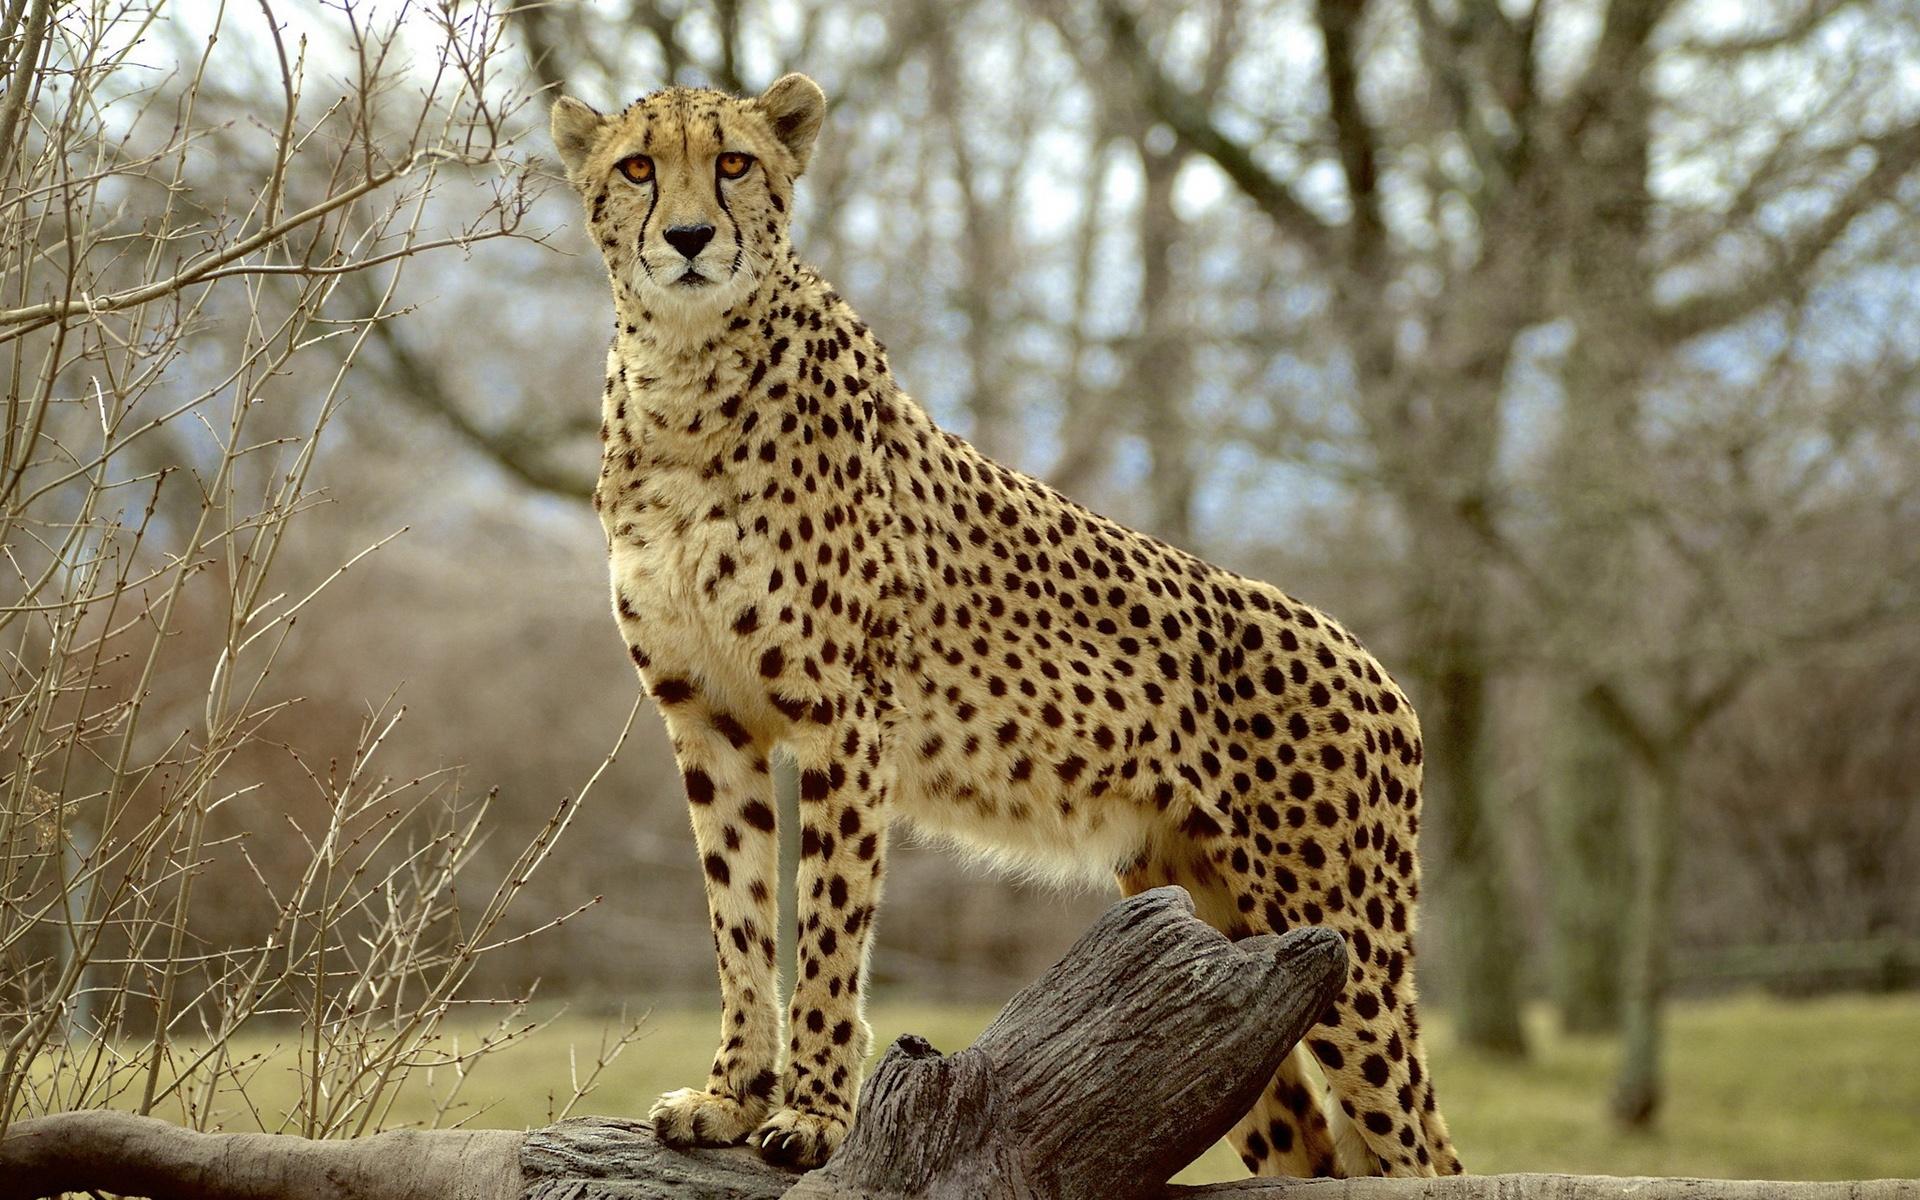 Download Wallpaper 1920x1200 Animal photography, cheetah ...